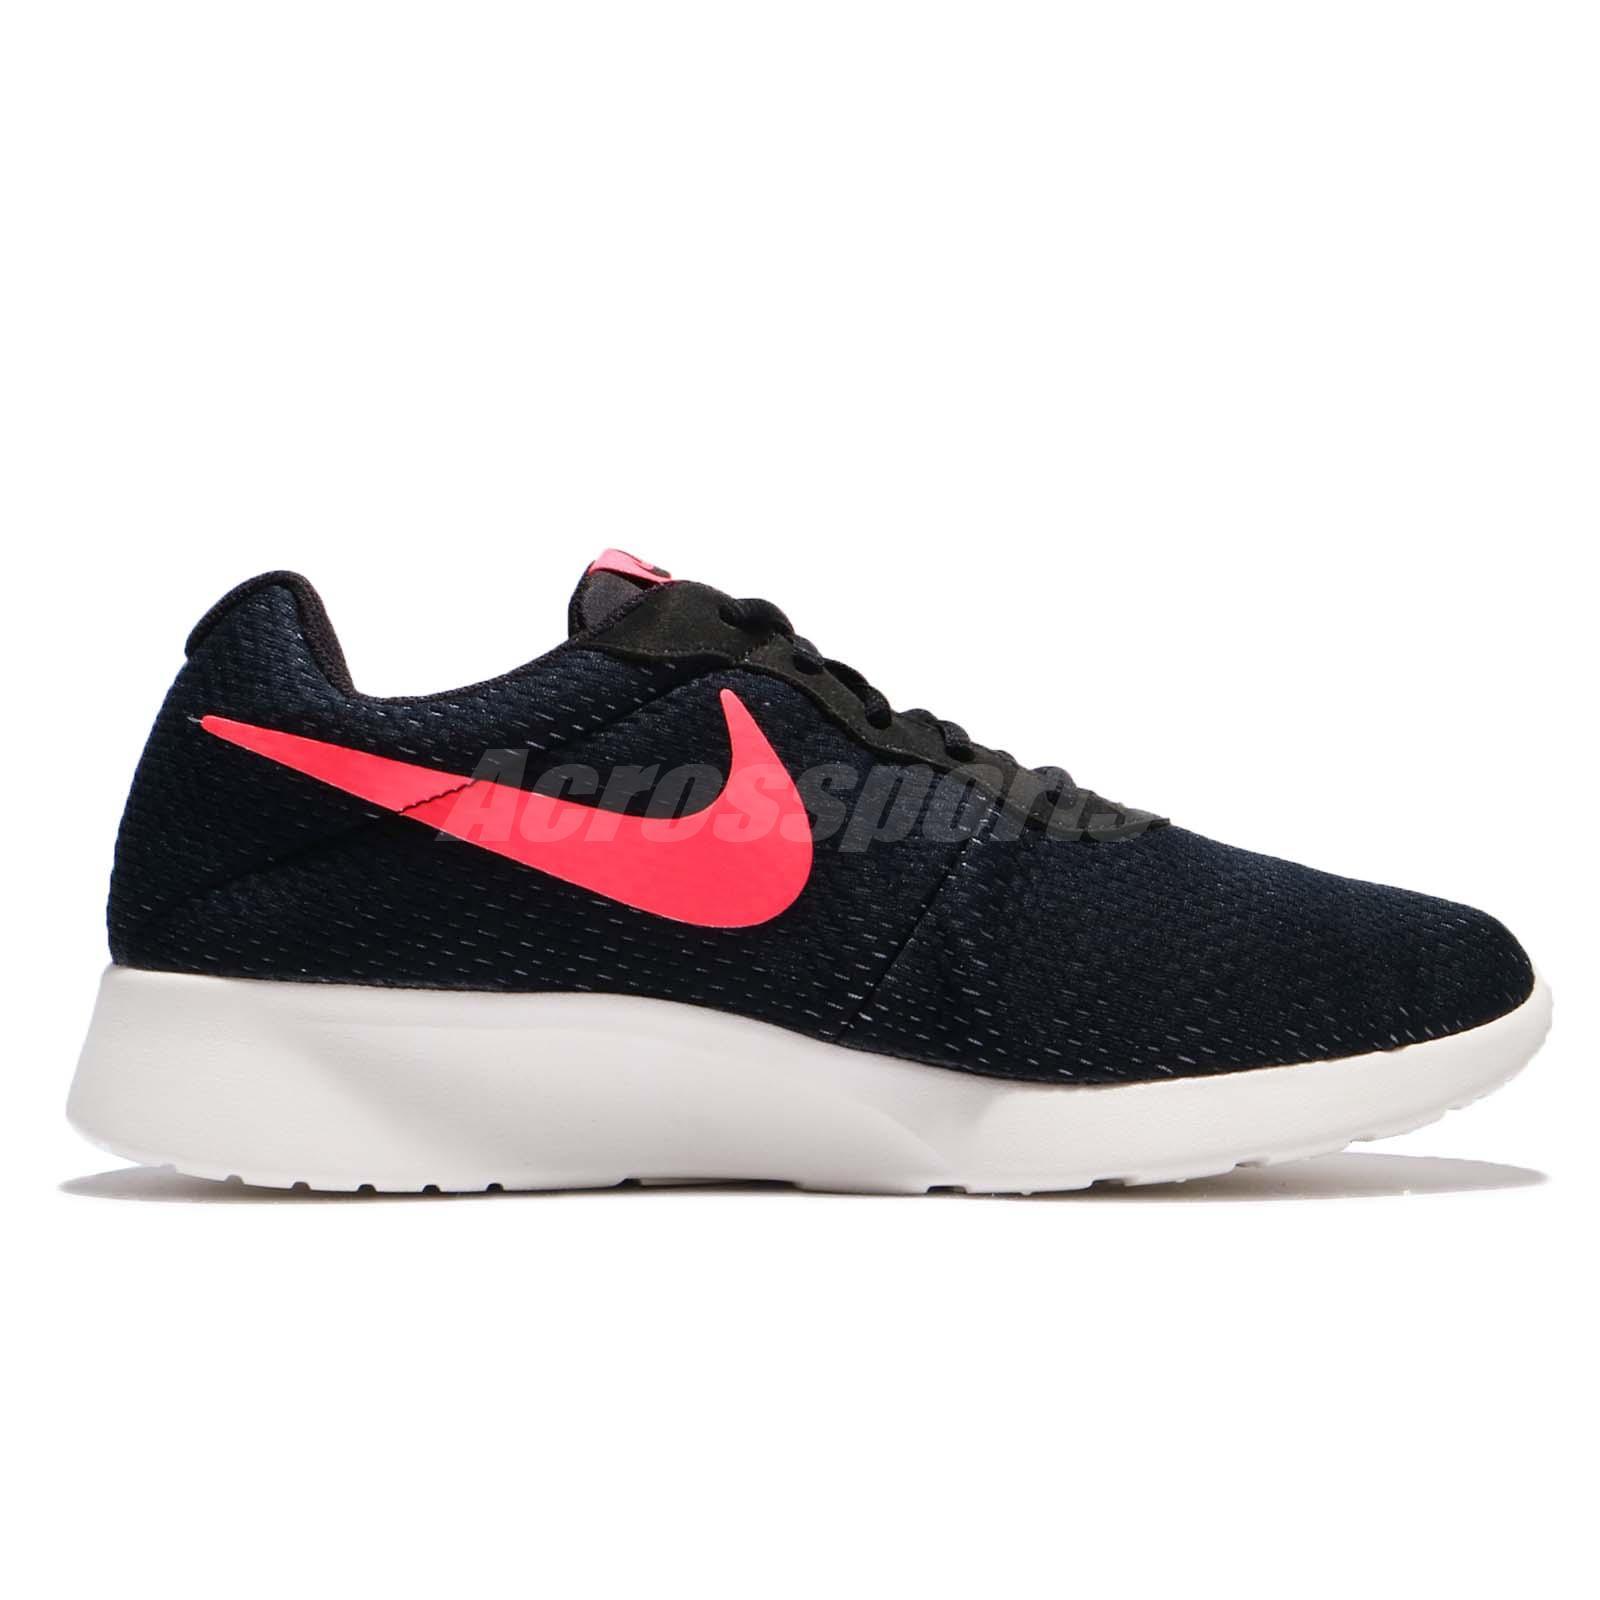 wholesale dealer 2e193 d445e australia nike mens tanjun se sneaker. 49.99. red b986f 46d9f  free  shipping condition brand new with box b379a f3594